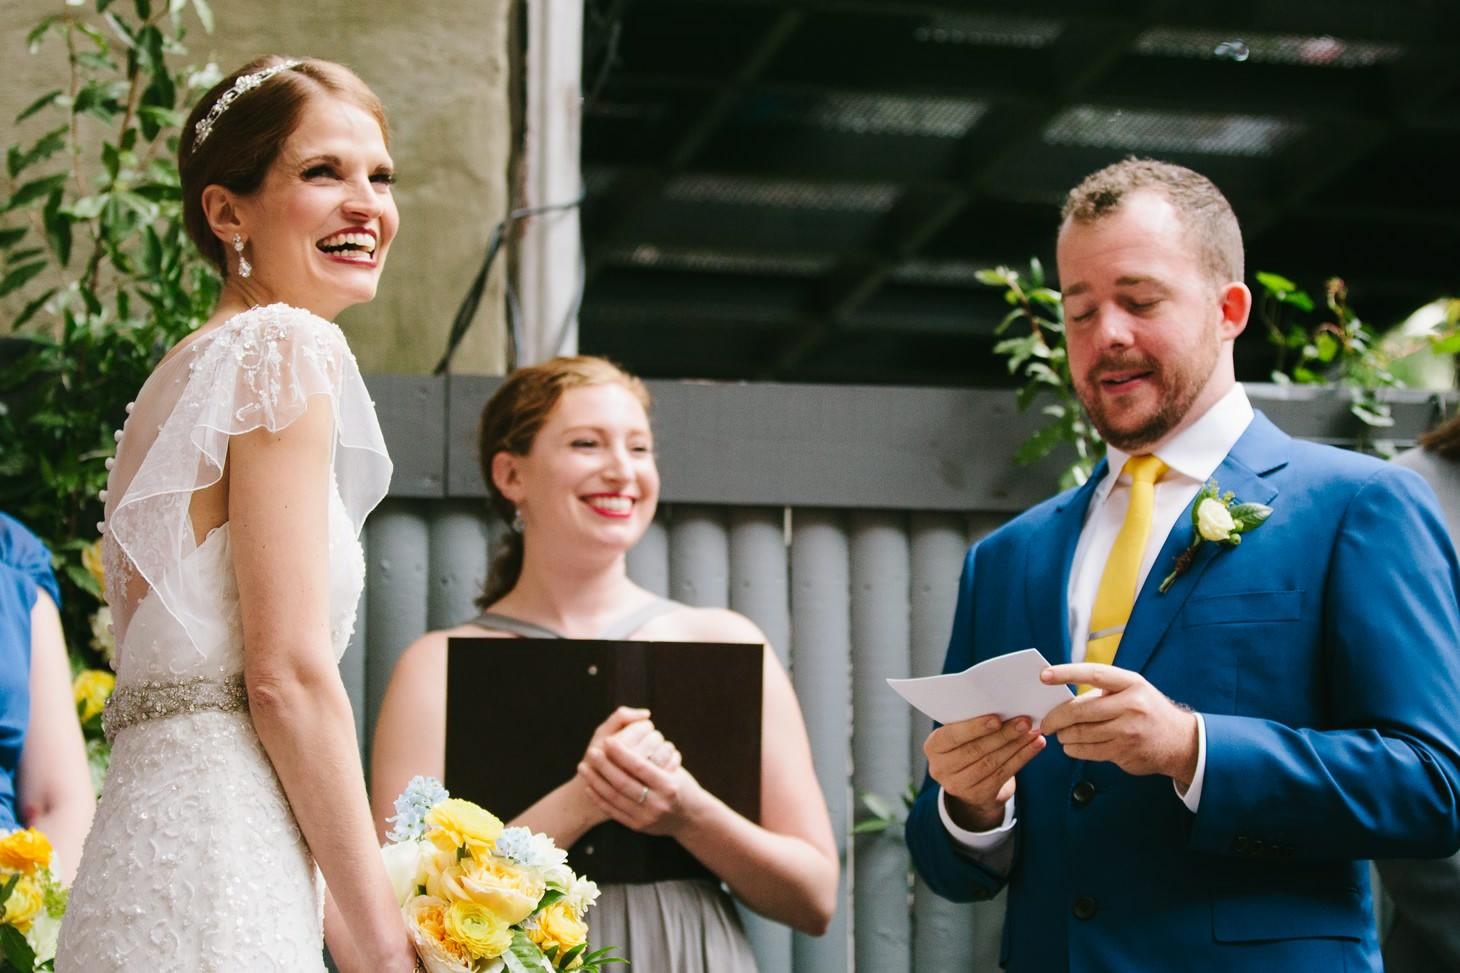 brooklyn-restaurant-wedding-nyc-weddingi-photographer-smitten-chickens03.jpg